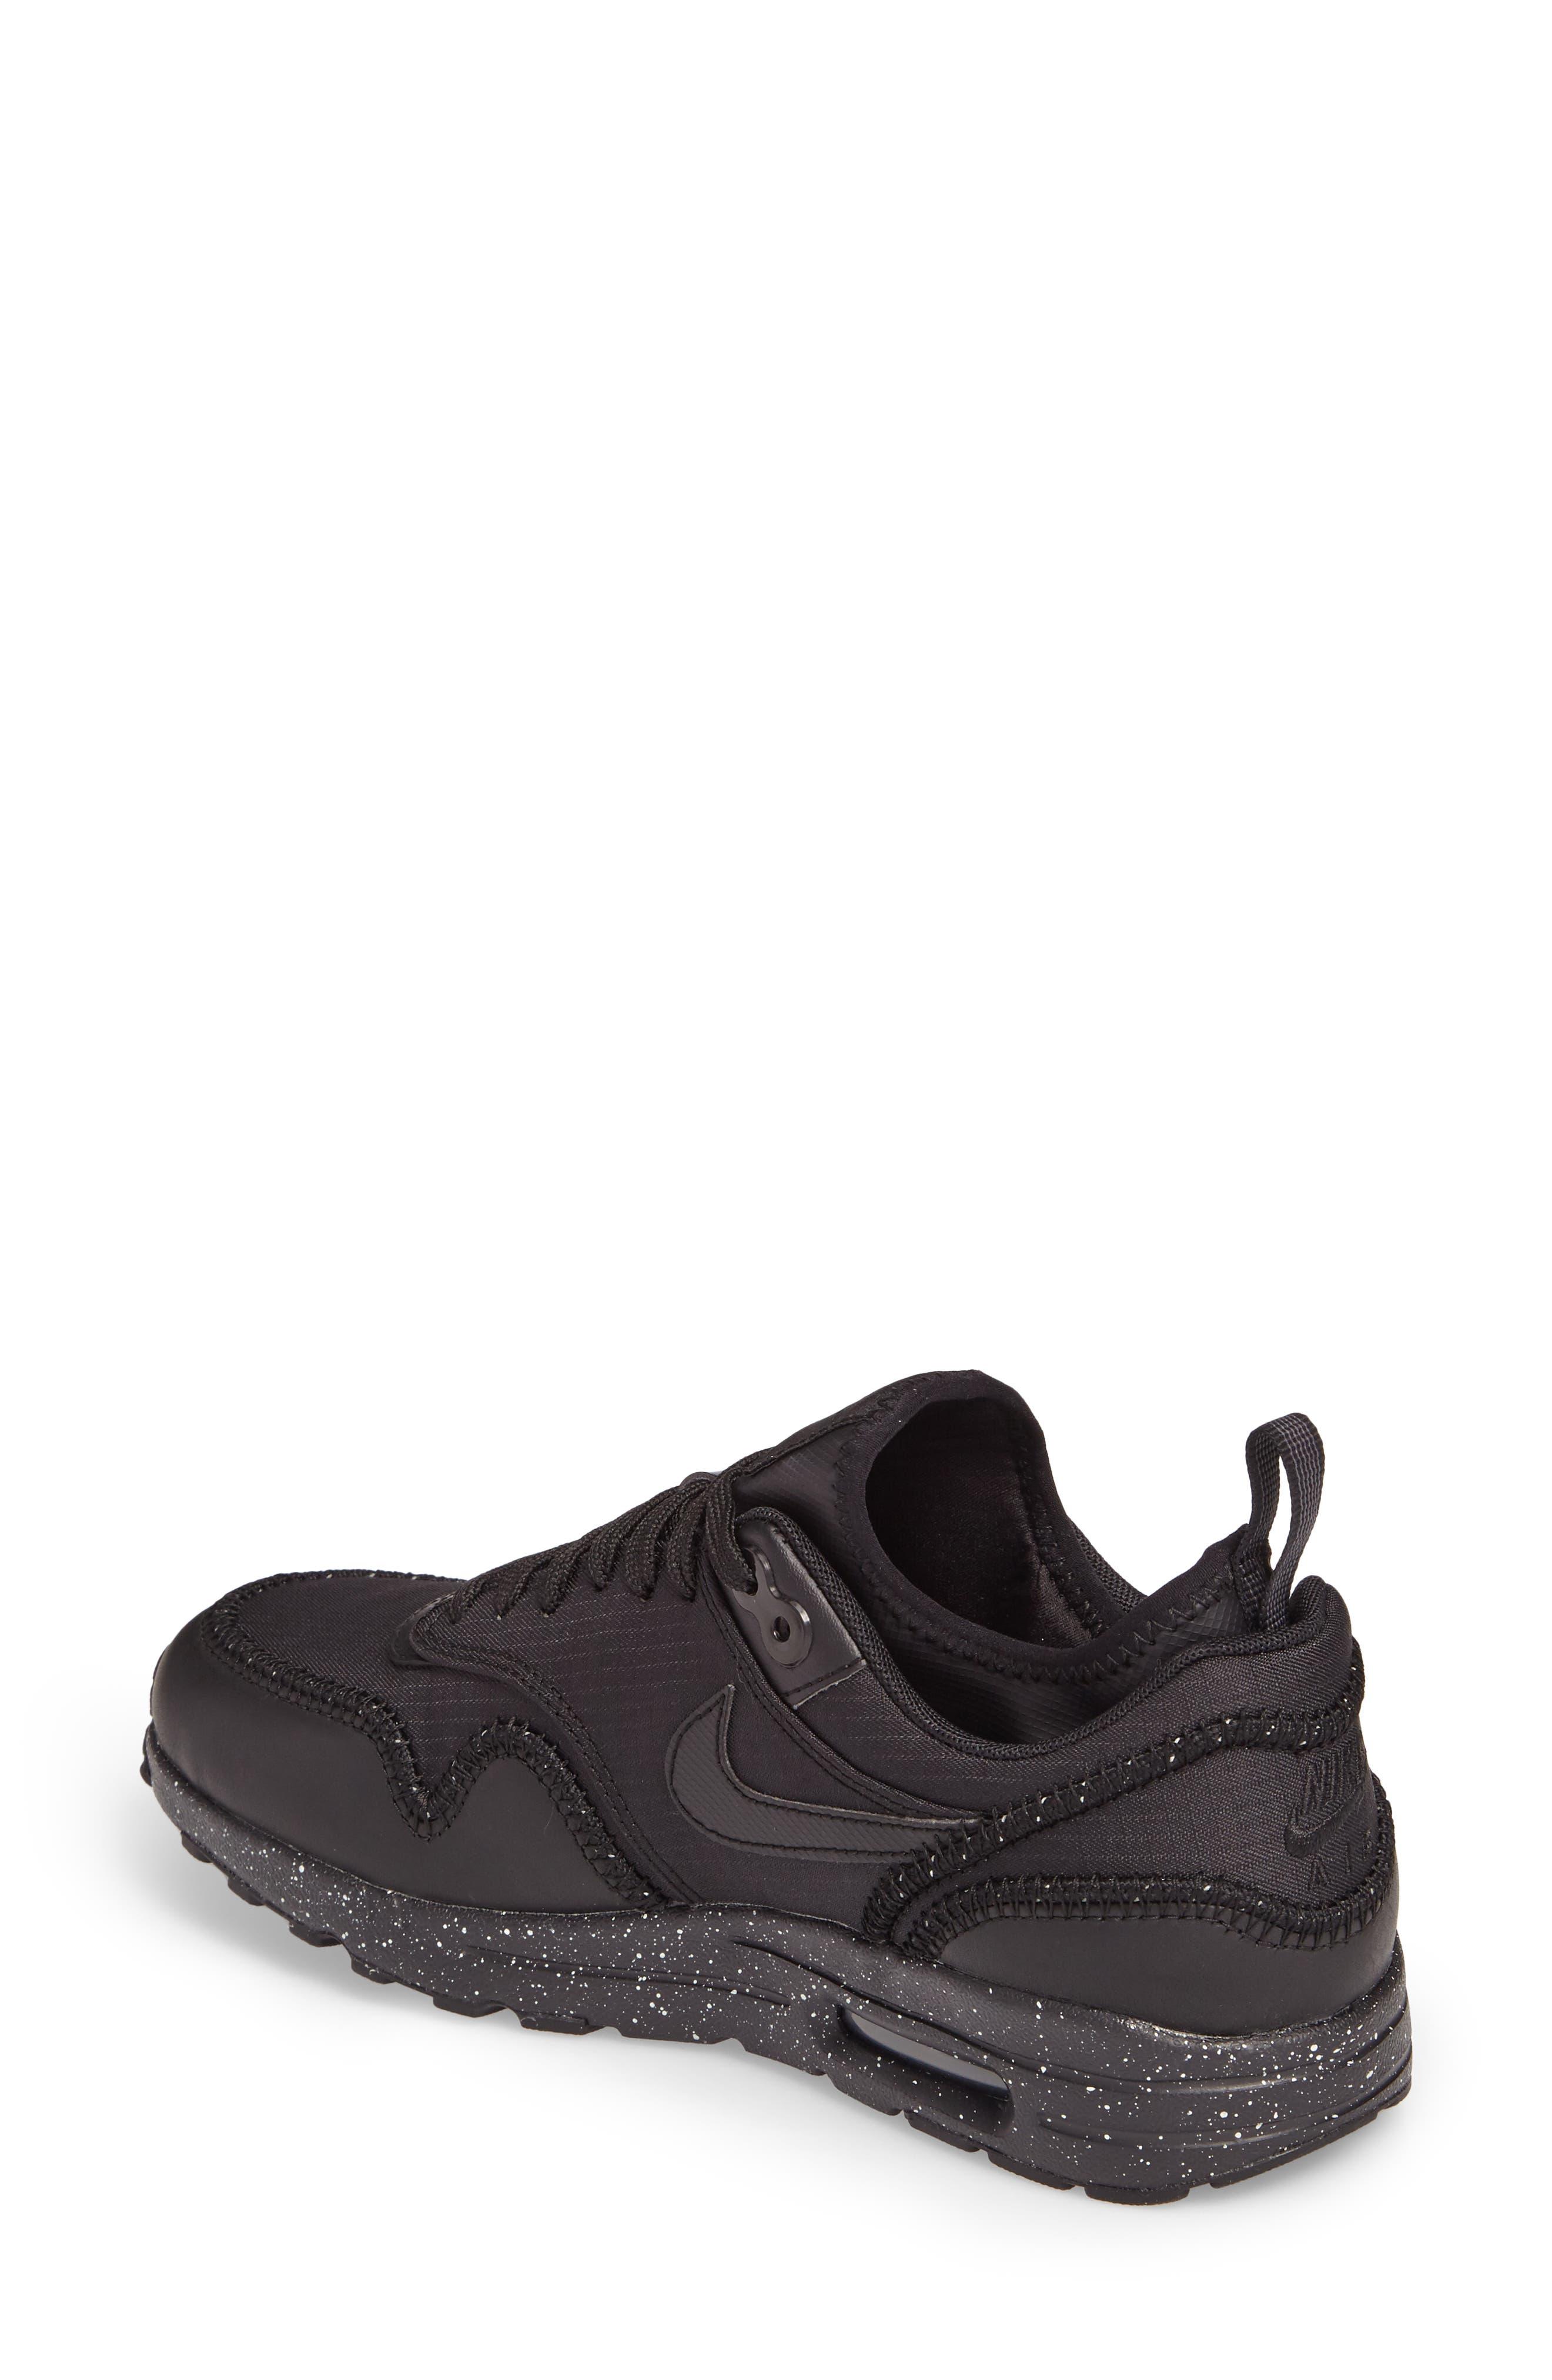 Air Max 1 Ultra 2.0 SI Sneaker,                             Alternate thumbnail 2, color,                             002